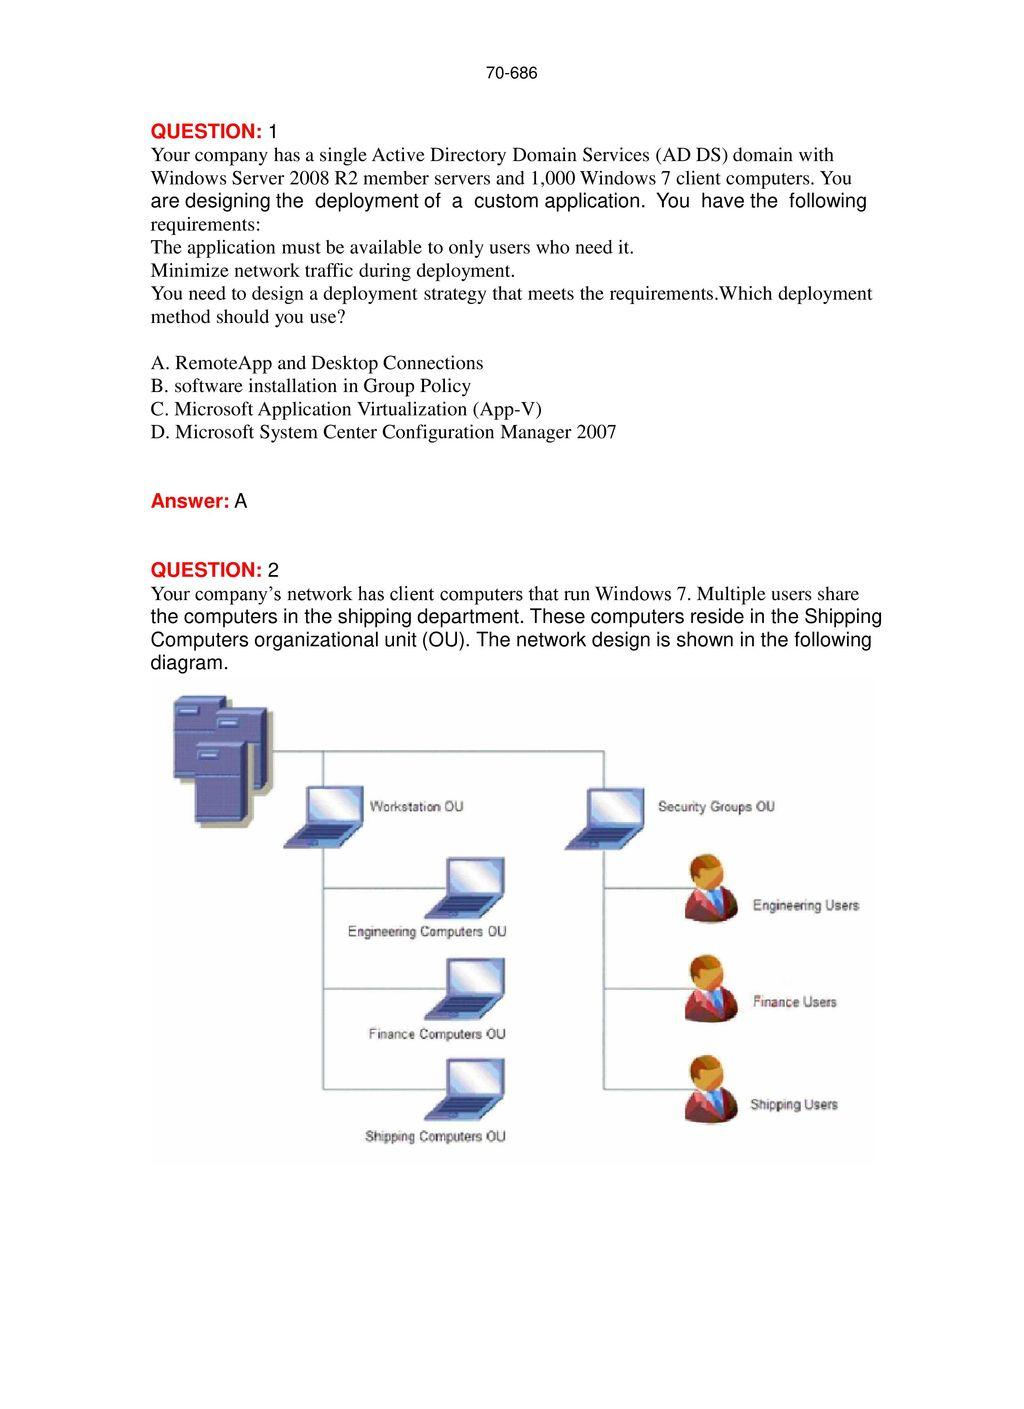 Microsoft Pro: Windows 7, Enterprise Desktop Administrator